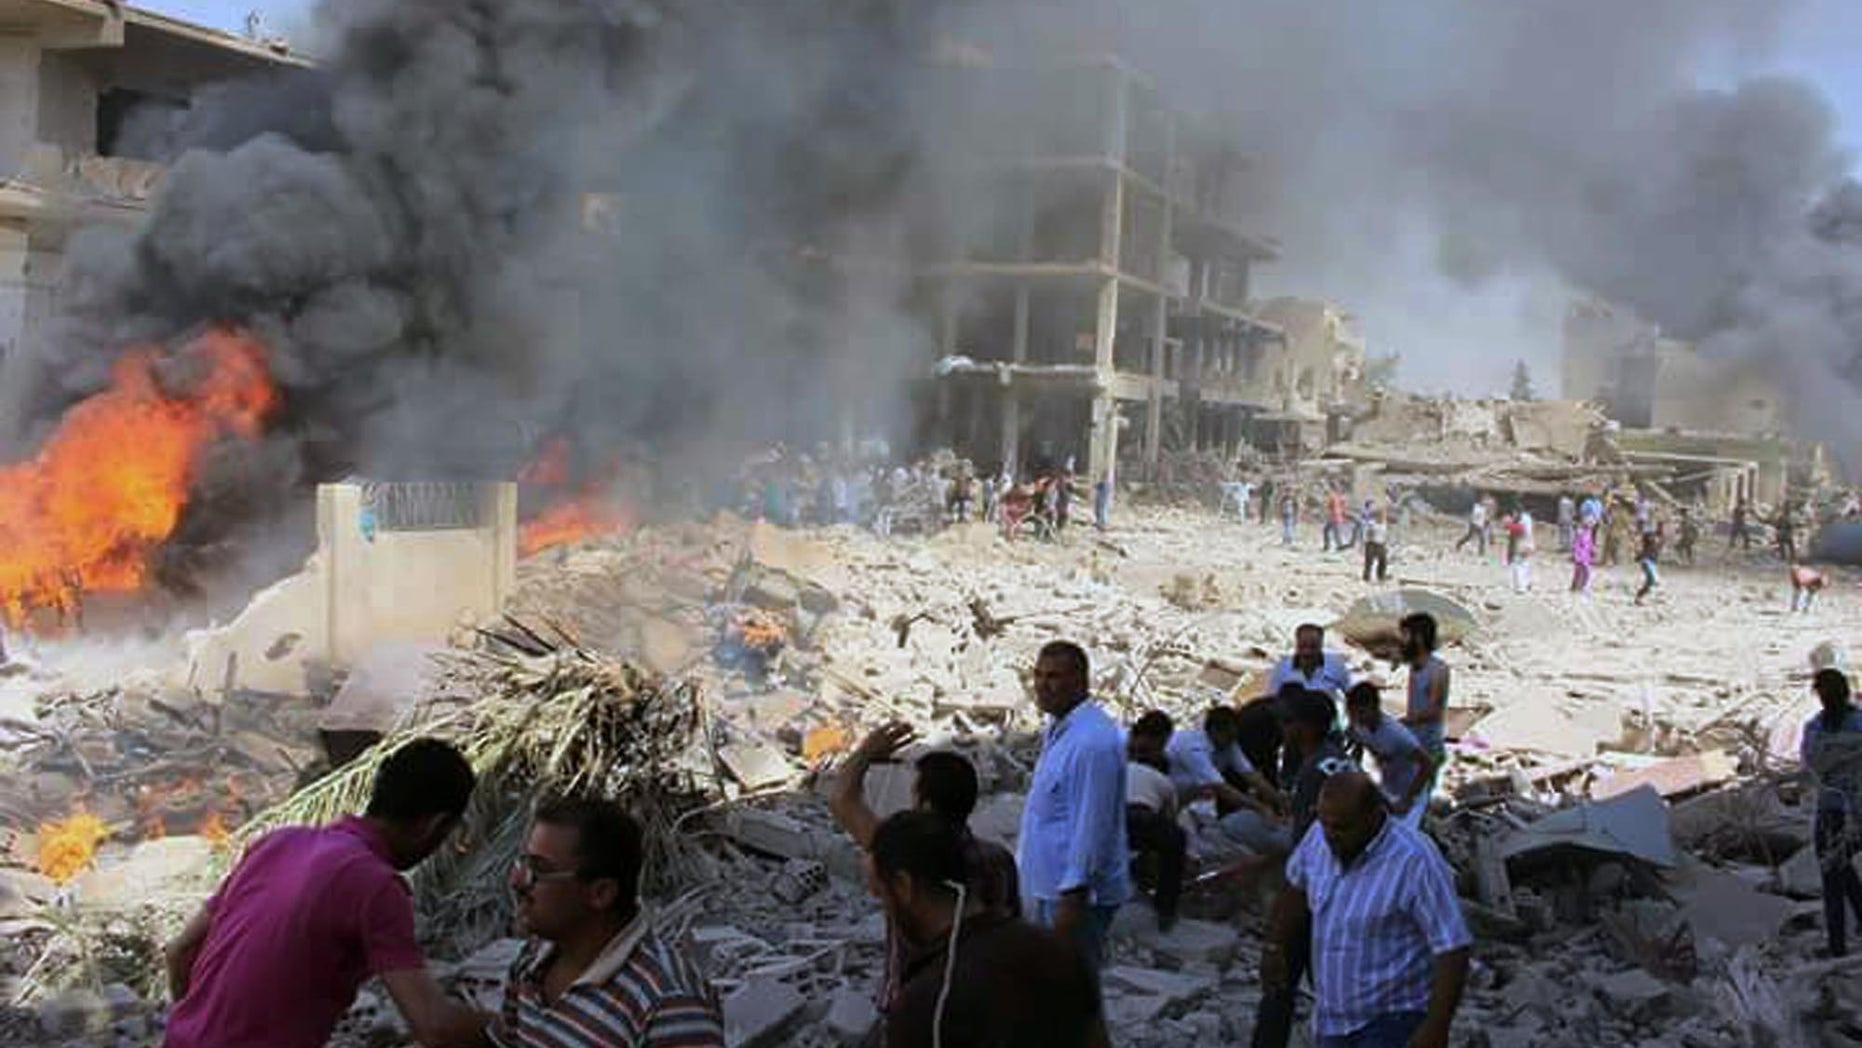 Syrians gather at the scene where twin bombings struck Kurdish town of Qamishli, Syria.